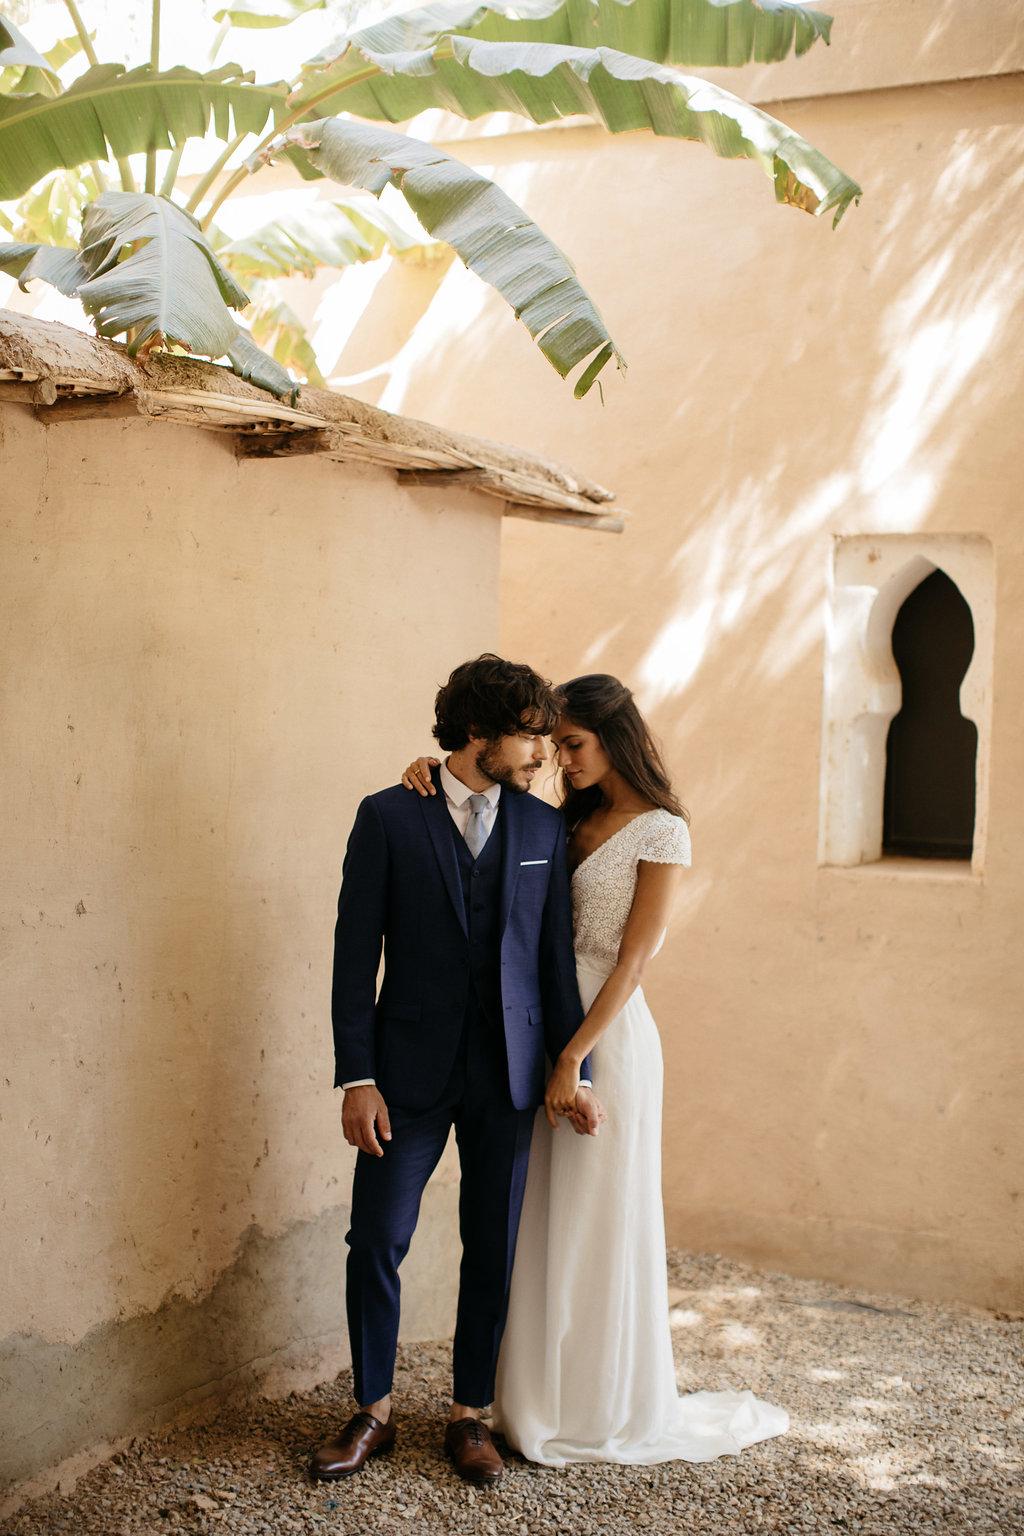 parisian-inspired-blog-mariage497-Yann-Audic-Faubourg-Saint-Sulpice-SS18_MG_8646.jpg